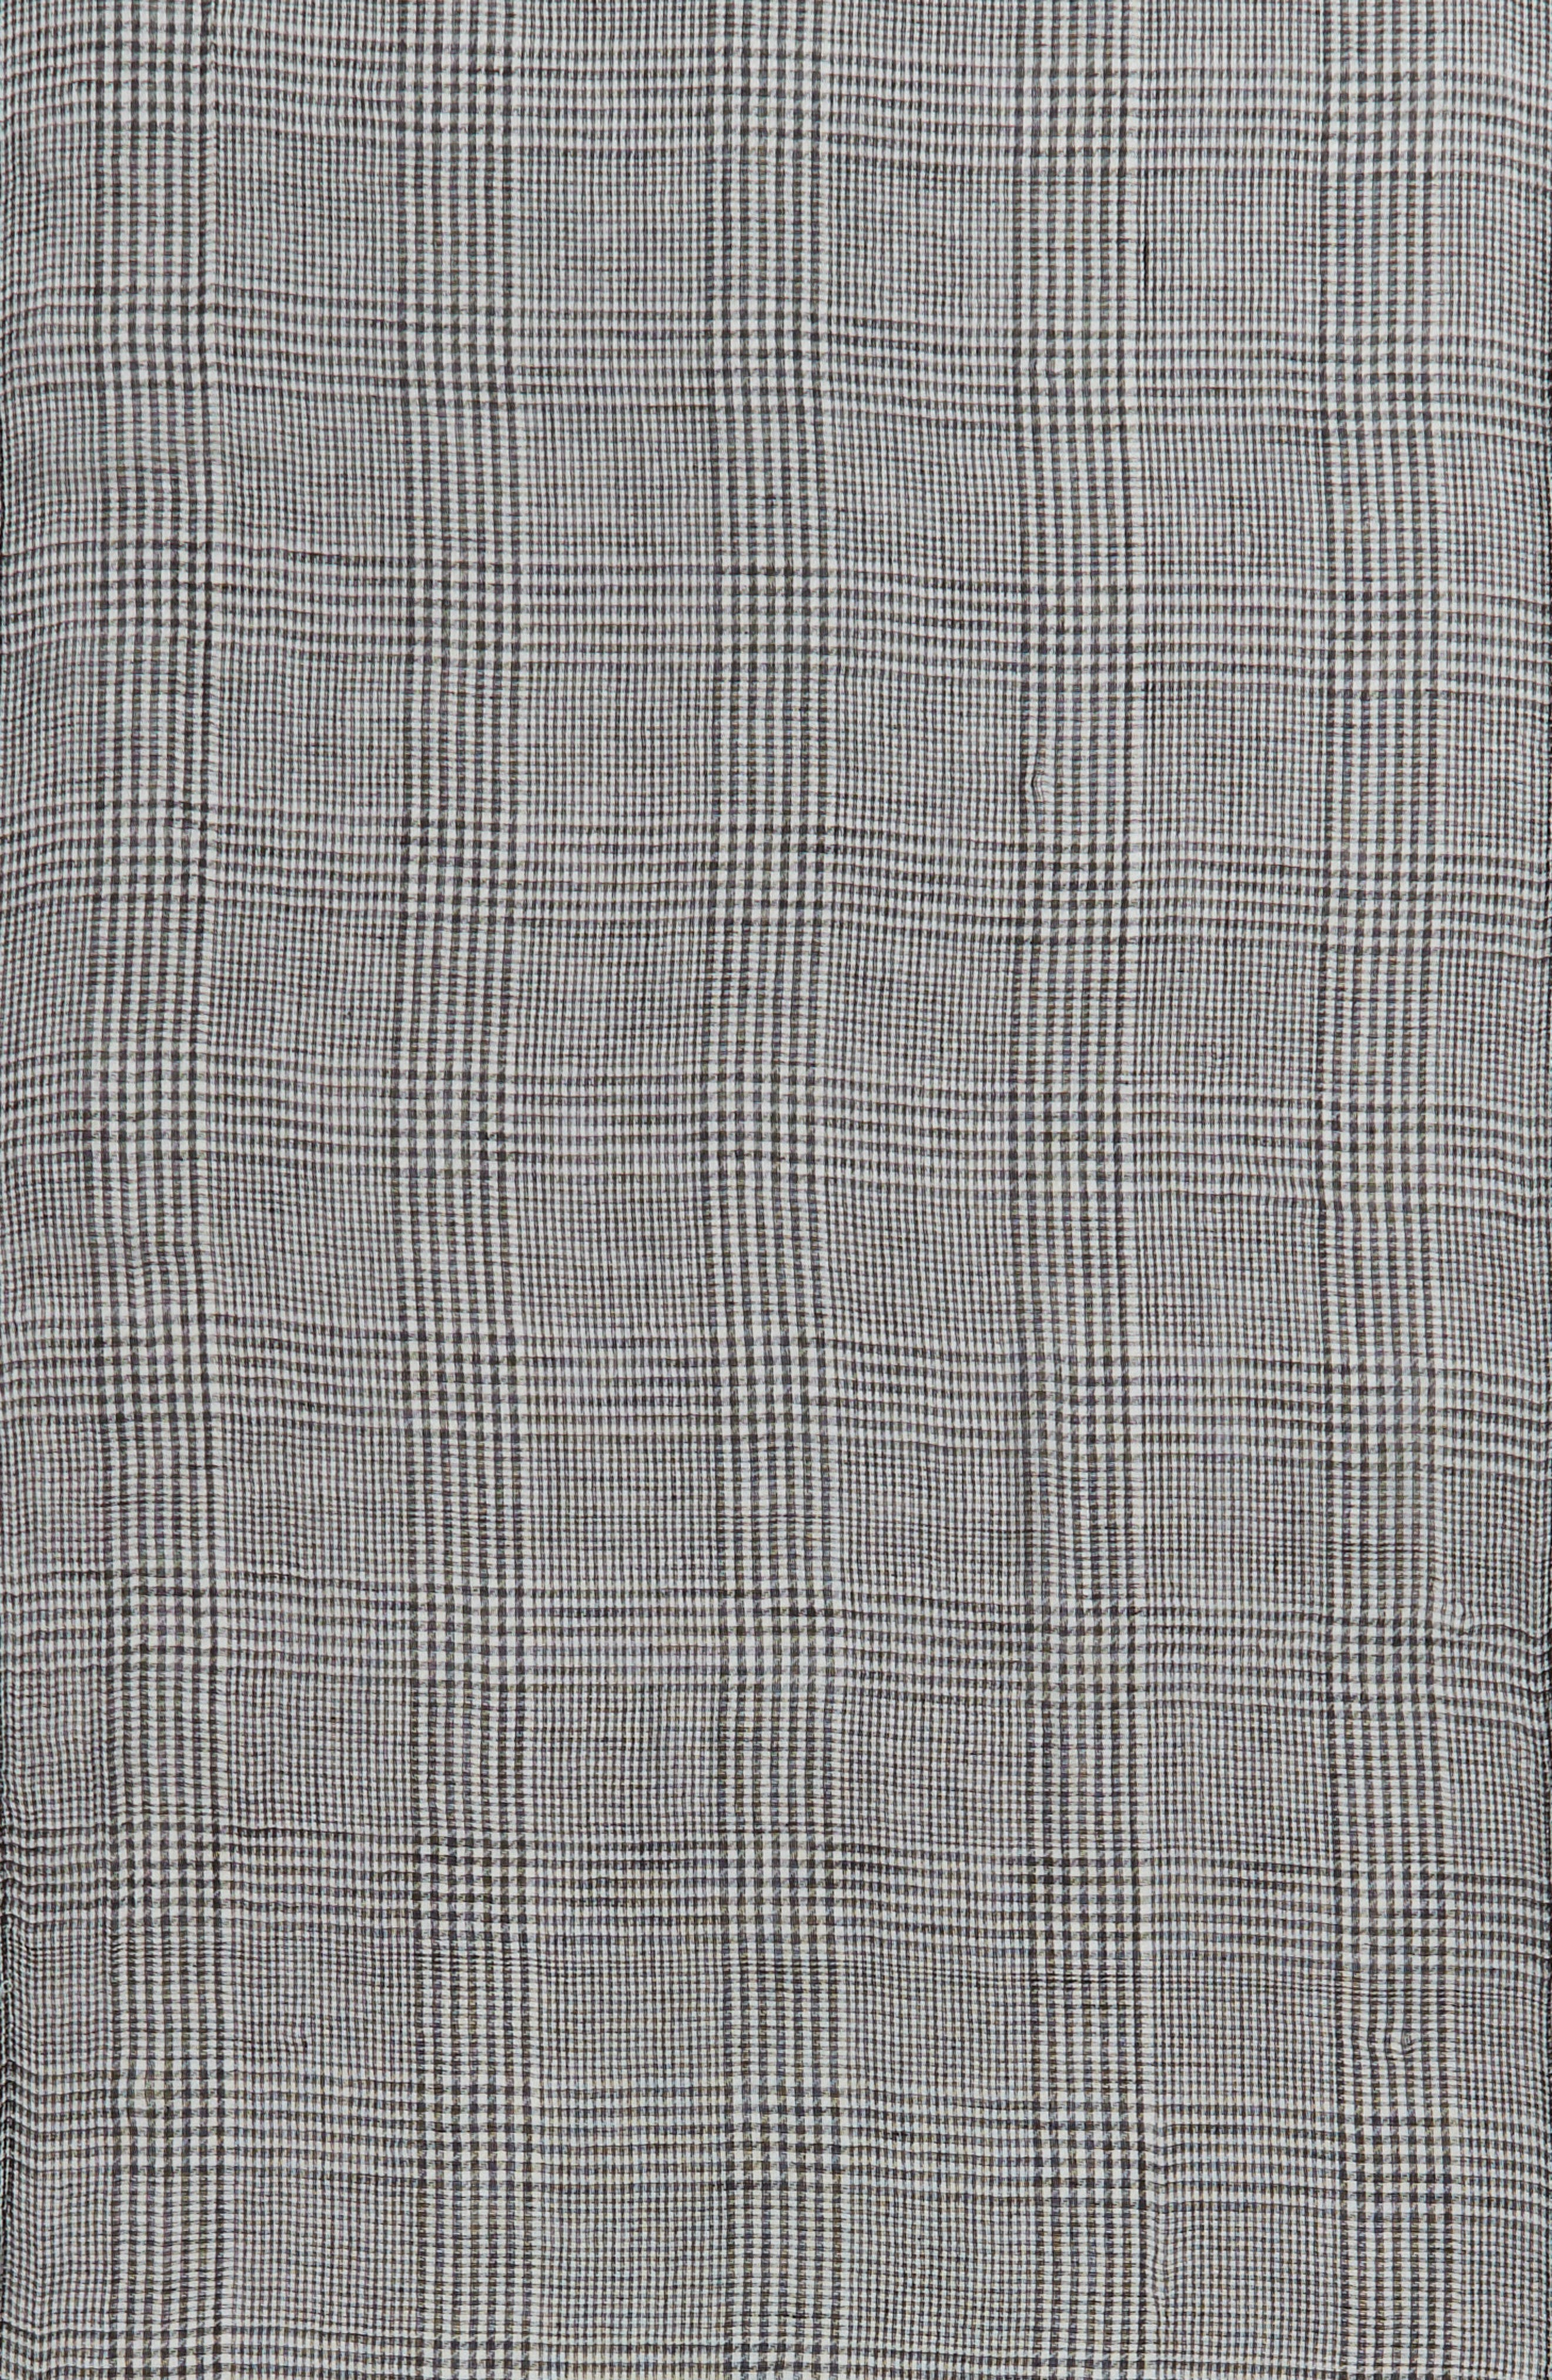 Menswear Plaid Oblong Scarf,                             Alternate thumbnail 4, color,                             GREY MULTI